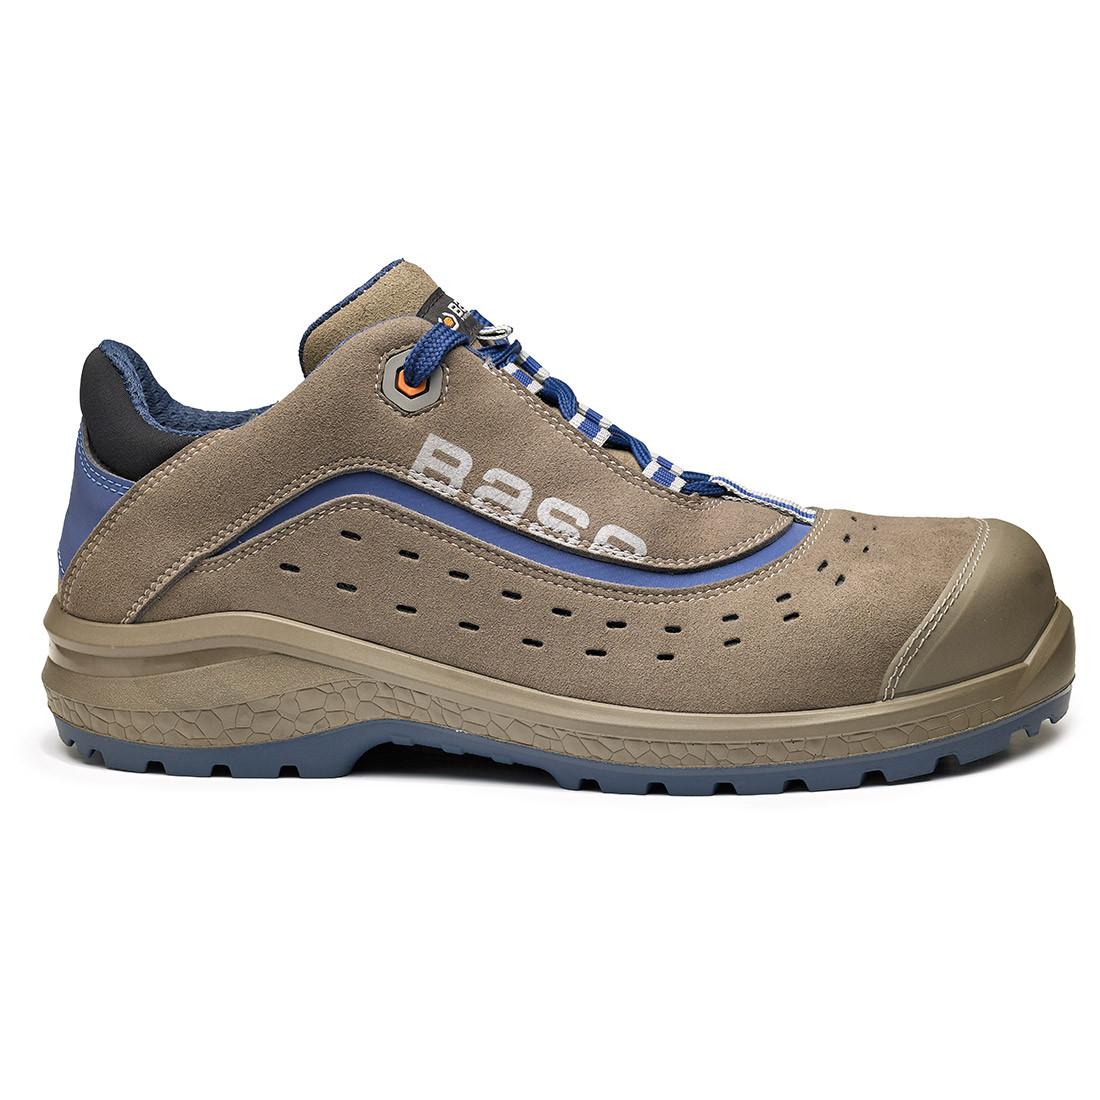 Pantofi Be-Active S1P SRC - Incaltaminte de protectie